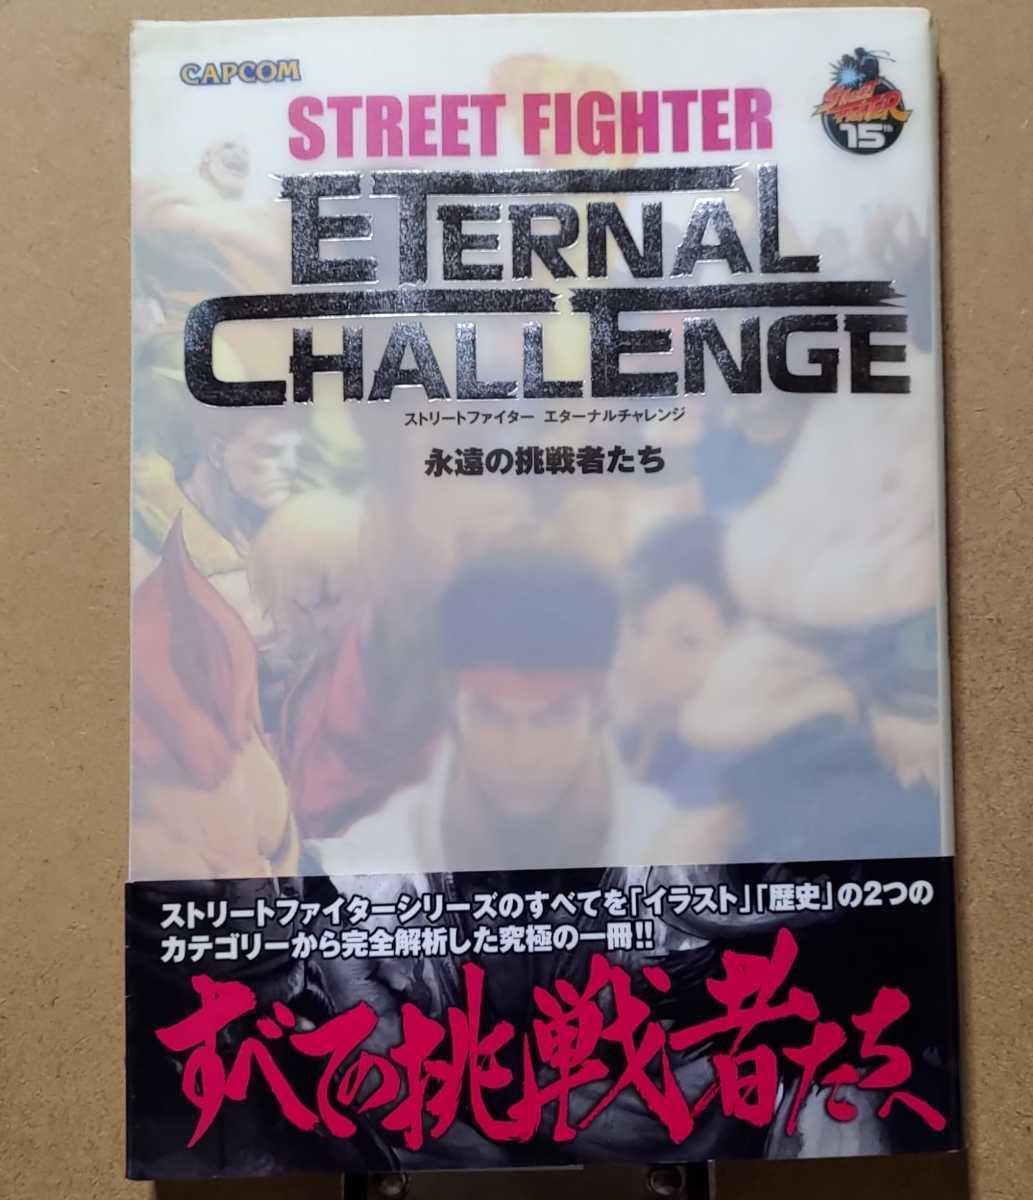 STREET FIGHTER ストリートファイター ETERNAL CHALLENGE エターナルチャレンジ 永遠の挑戦者たち 初版本 安田朗 あきまんAKIMAN 西村キヌ